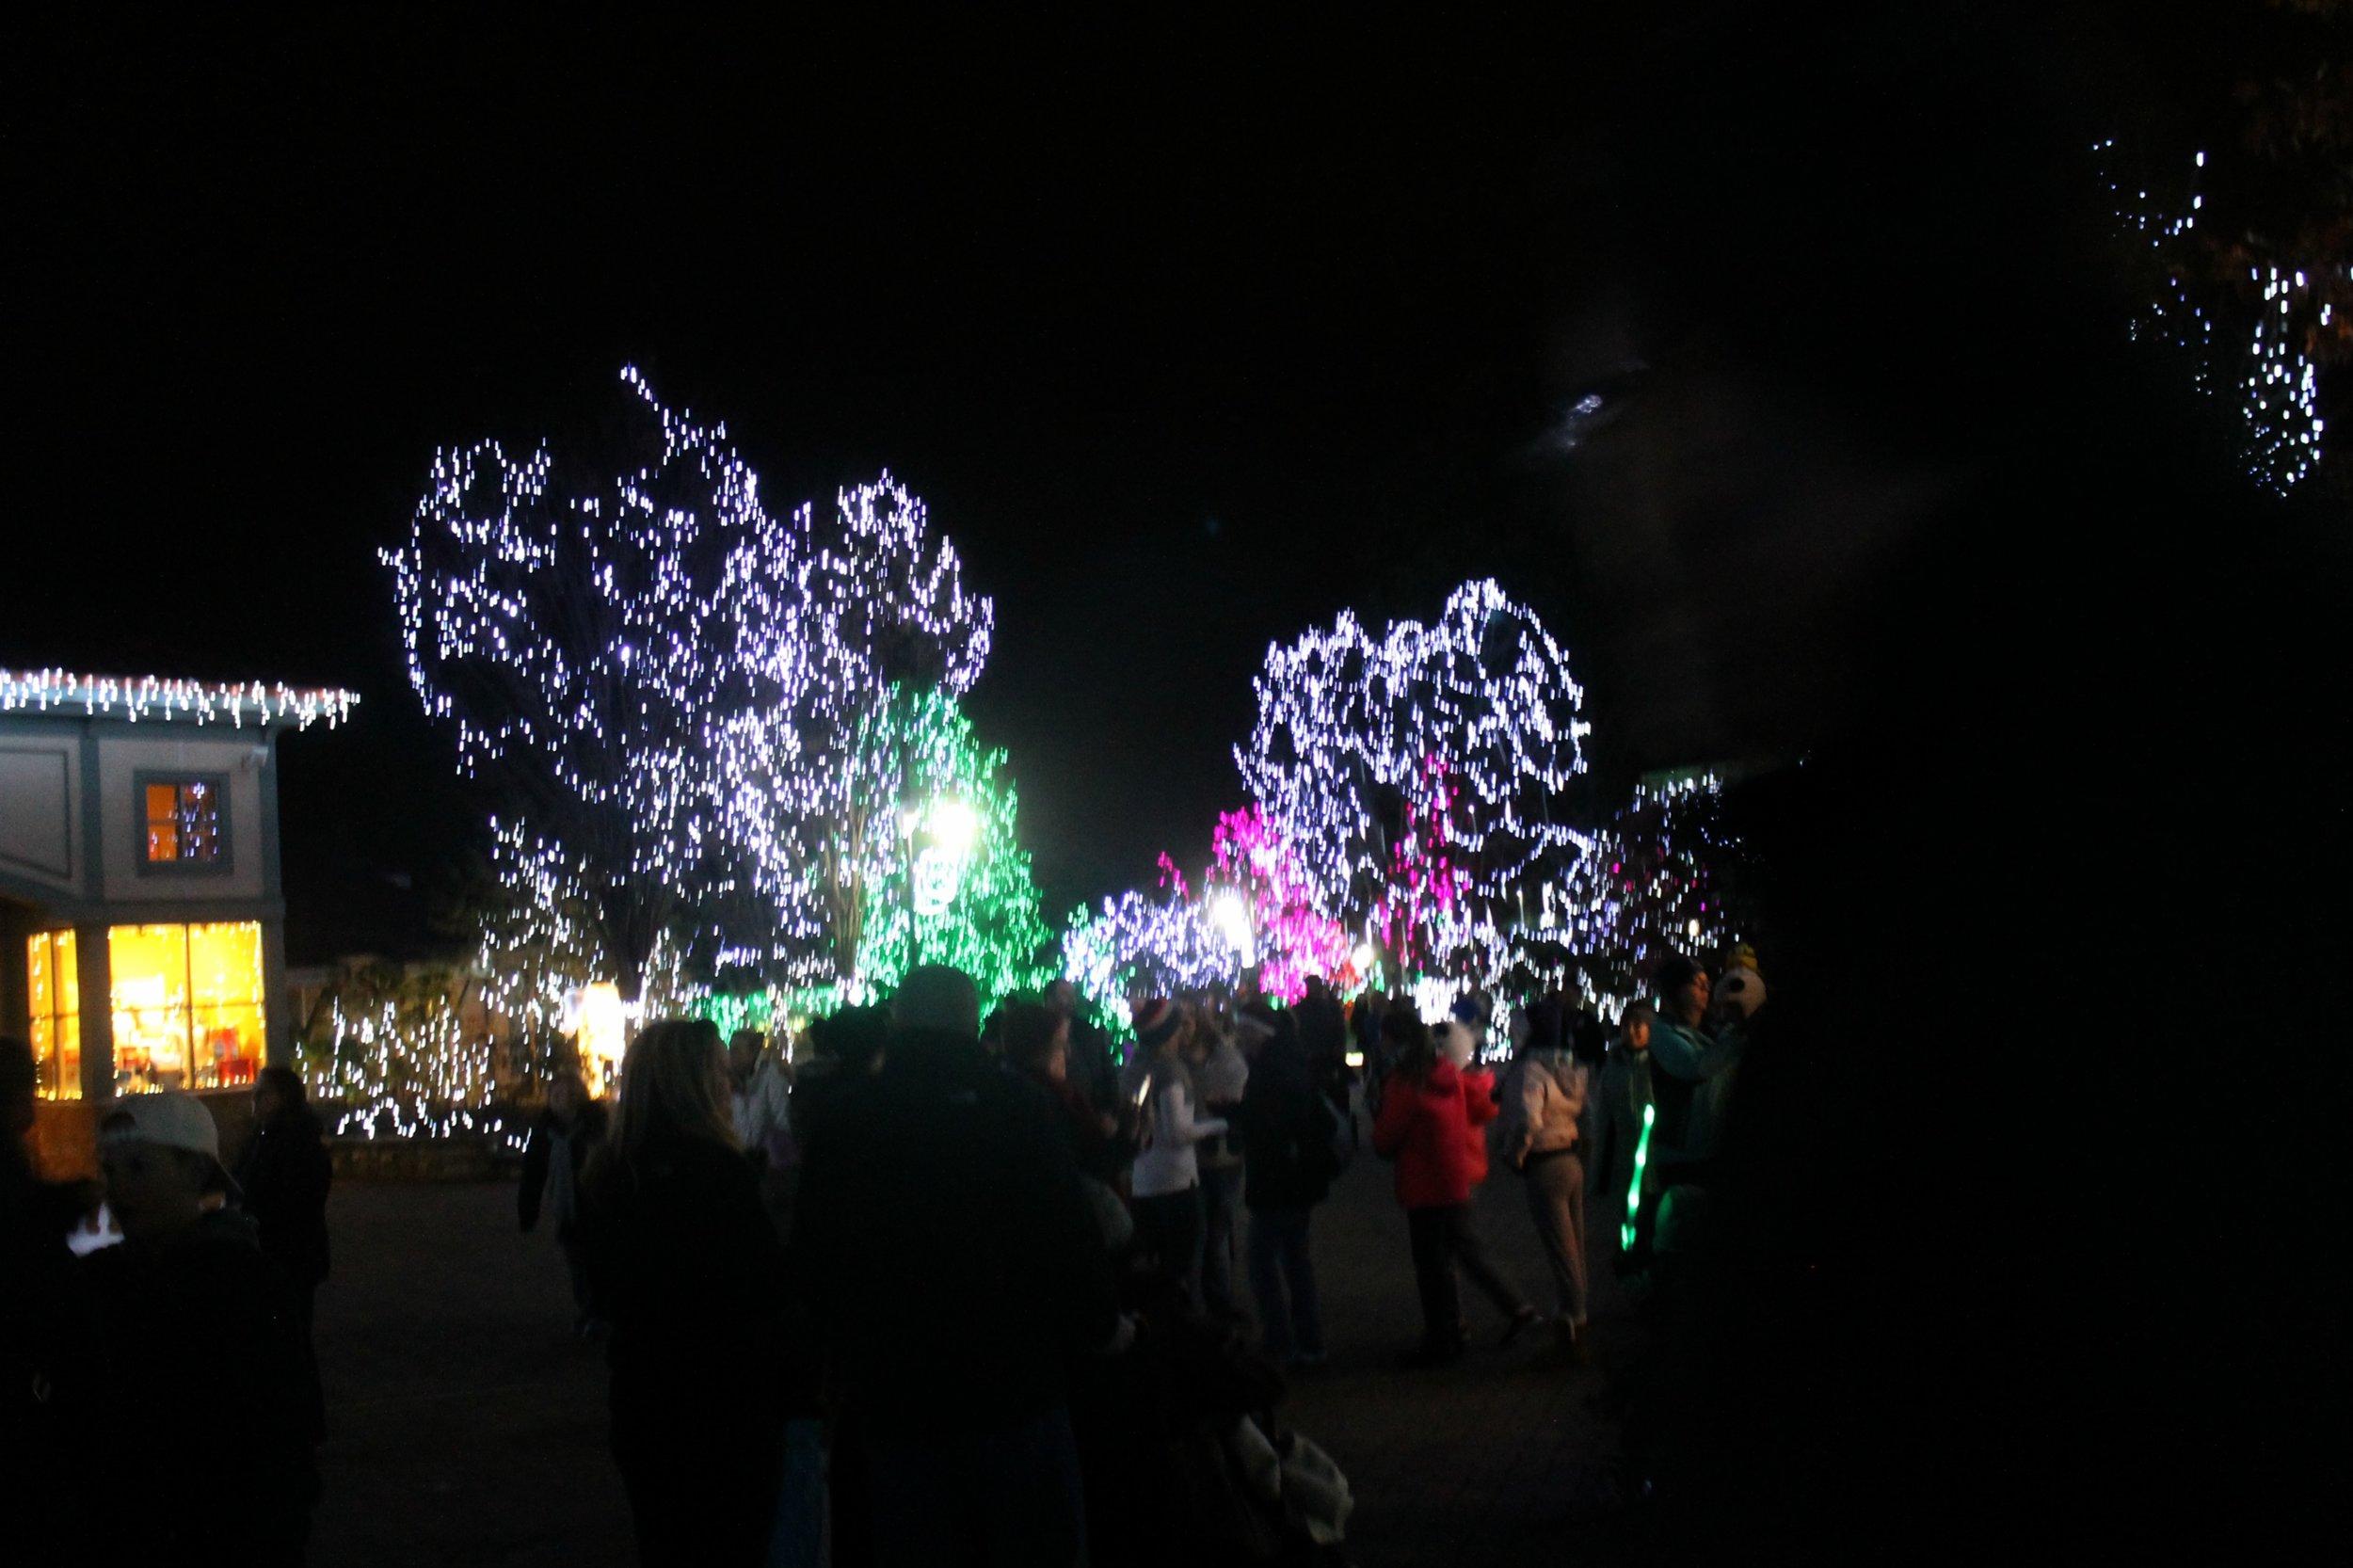 lights7.jpg